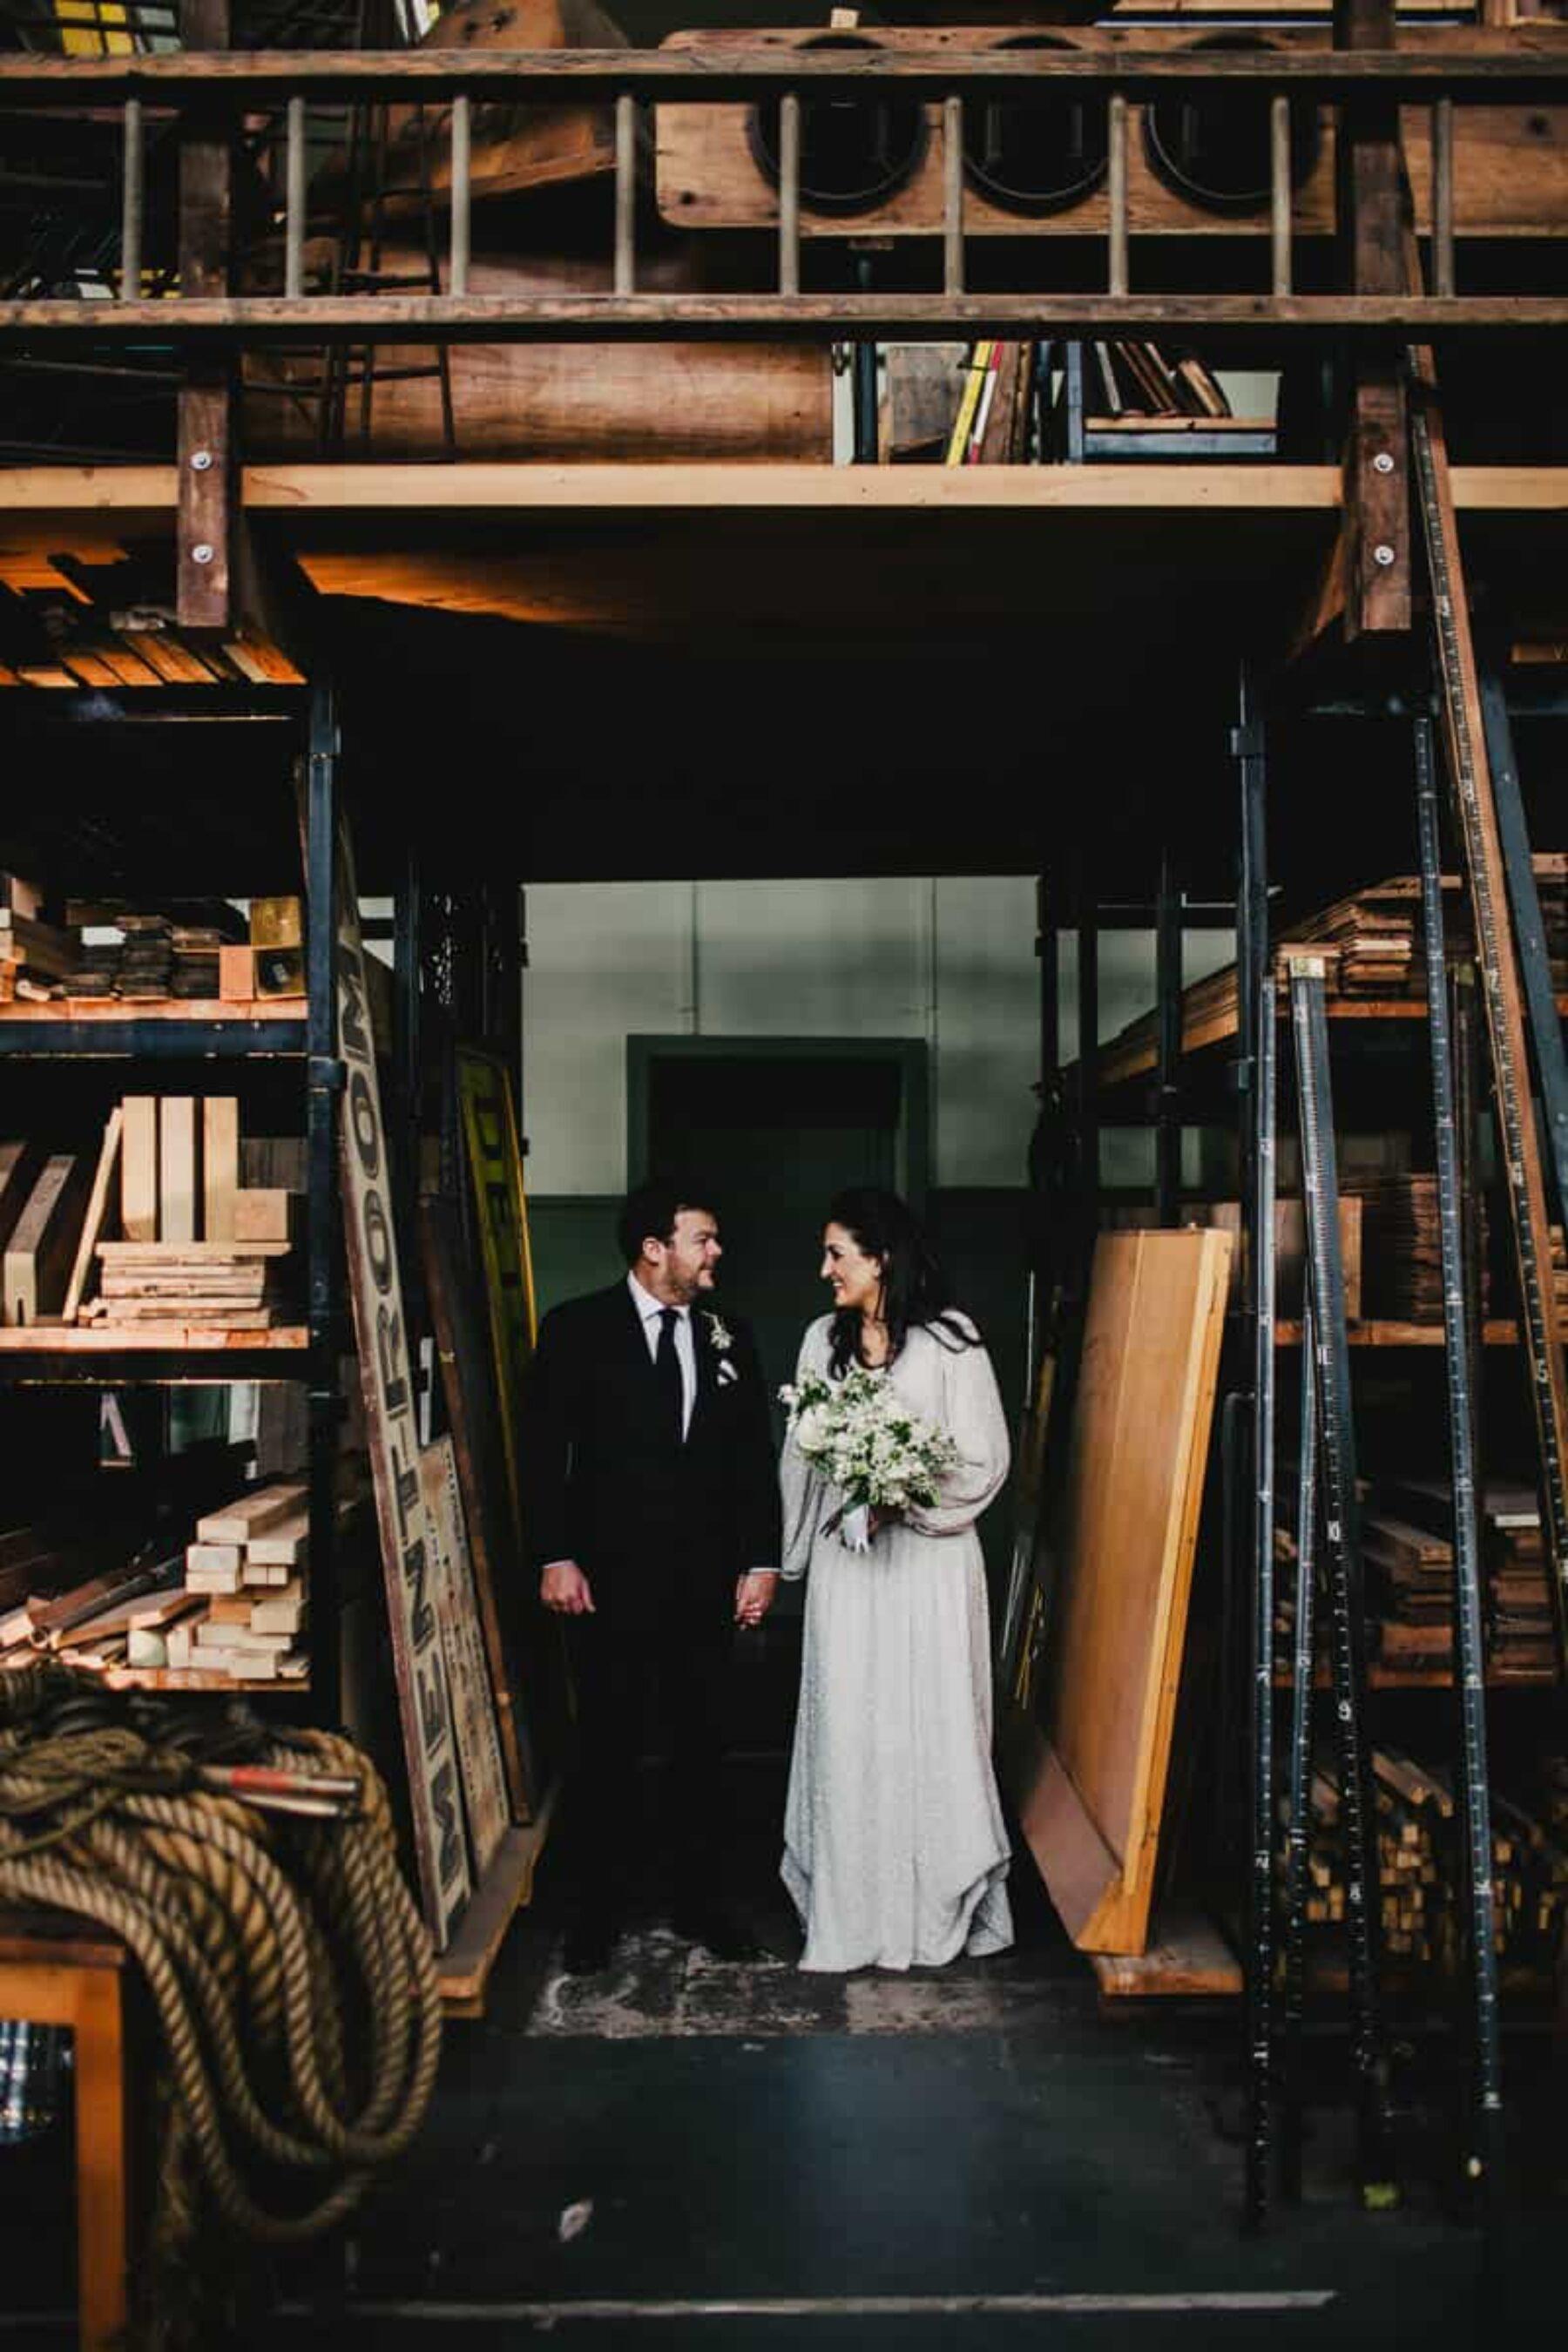 Melbourne warehouse wedding at Lauren's Hall - photography by Daniel Brannan